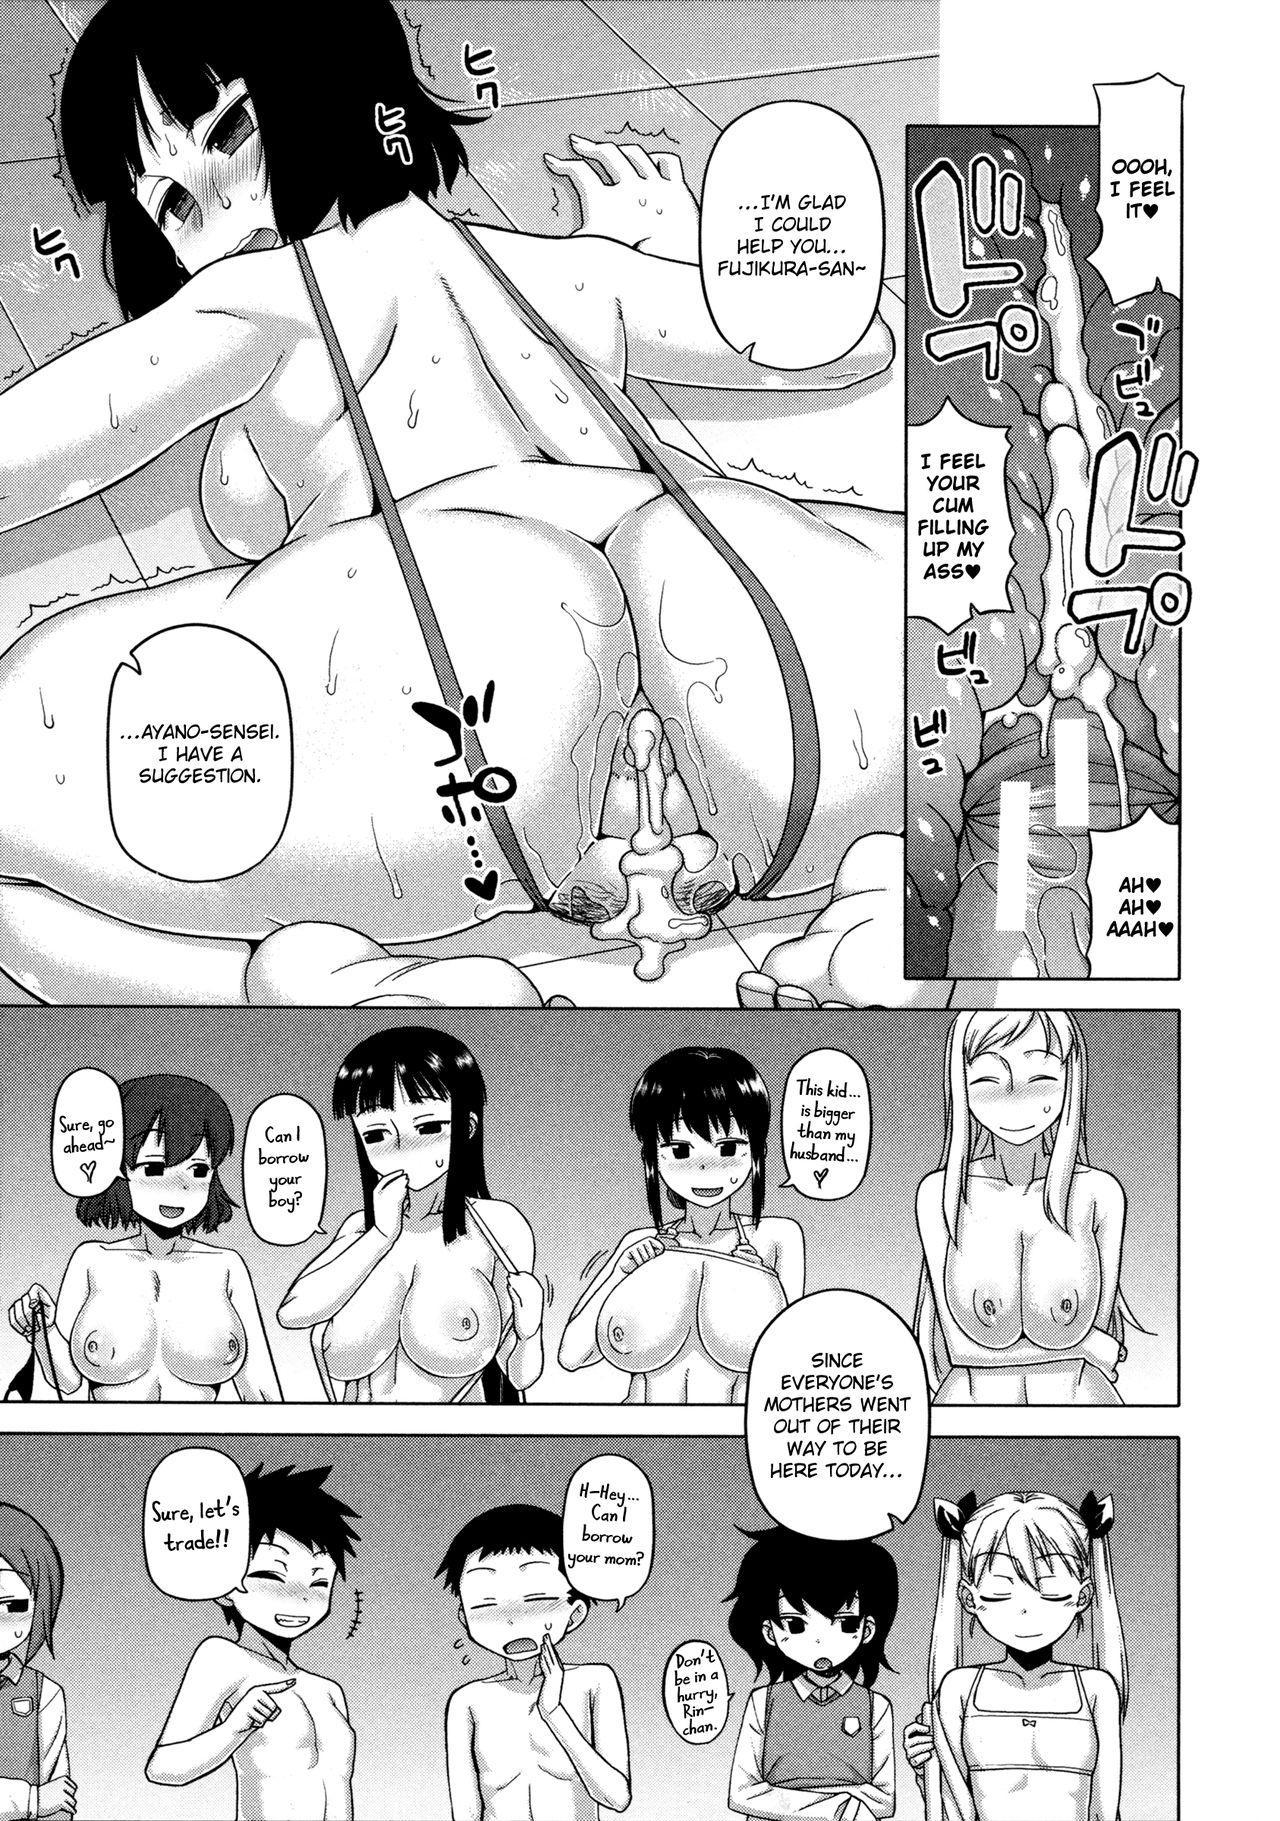 [Takatsu] Ou-sama Appli - King App [English] [TheRobotsGhost] 148